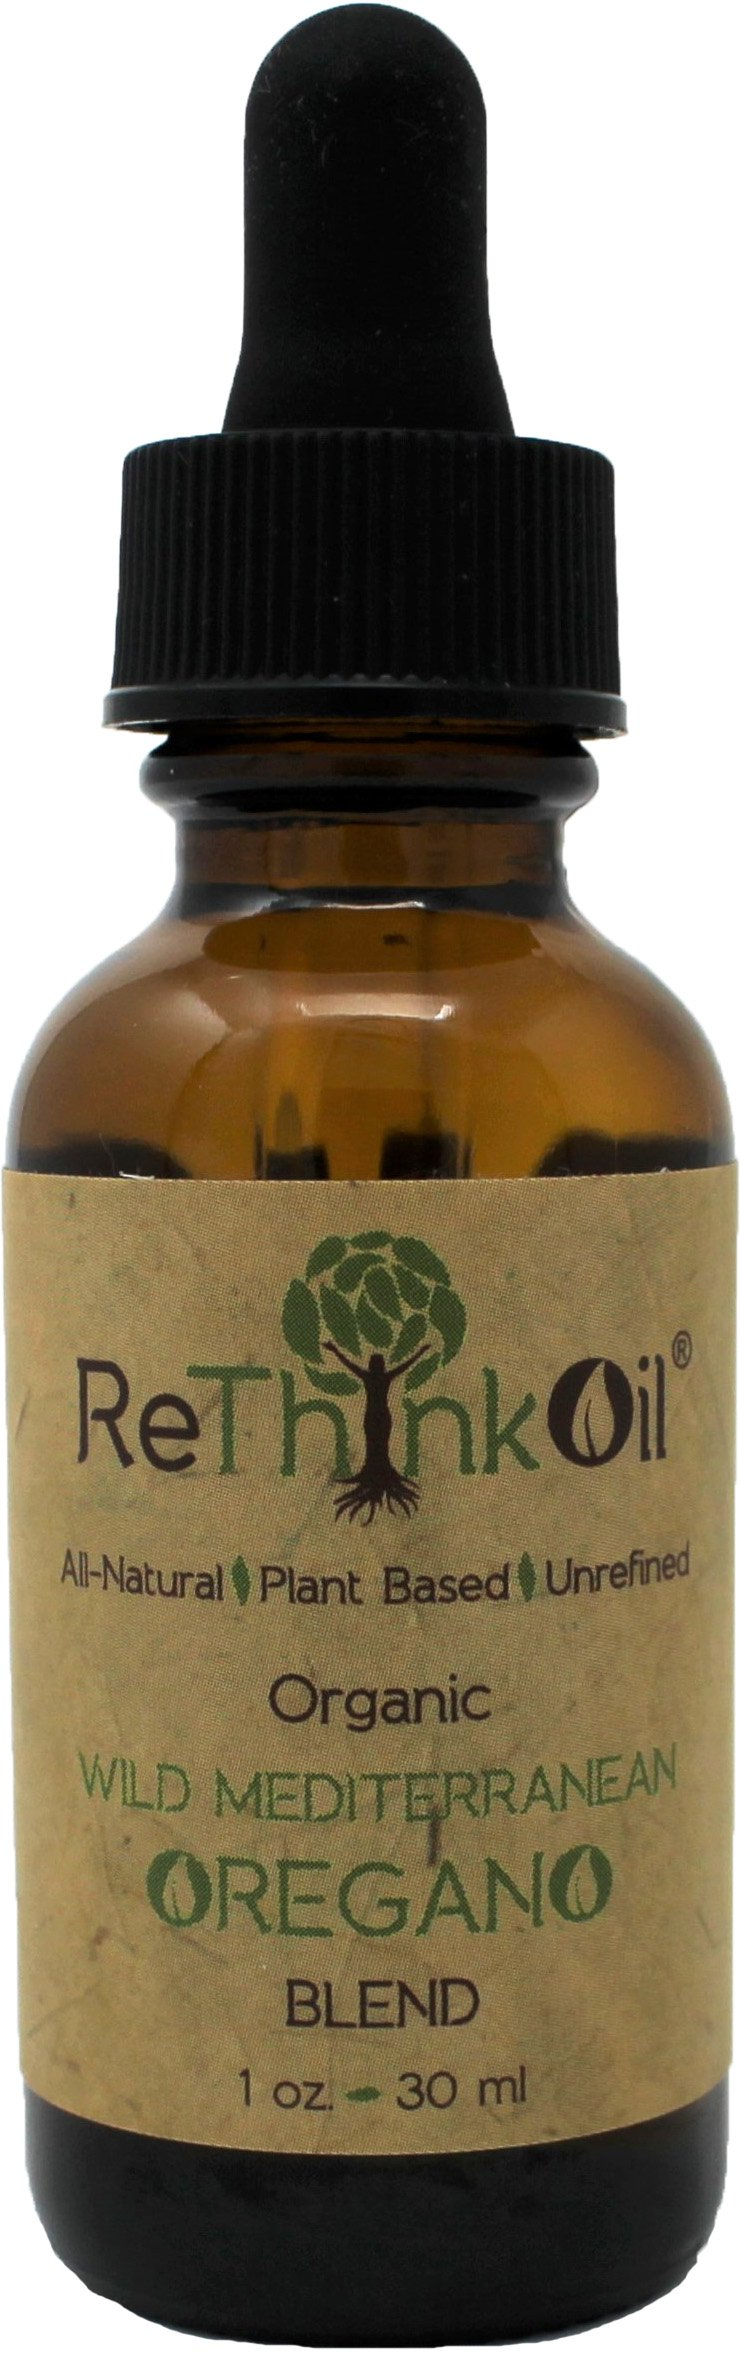 Rethink Oil - 1 oz - (1:4 Dilution) - 4 Parts Organic PDO Kolymvari Olive Oil to 1 Part Organic Oregano Oil - Food Grade Pre-Diluted Blend